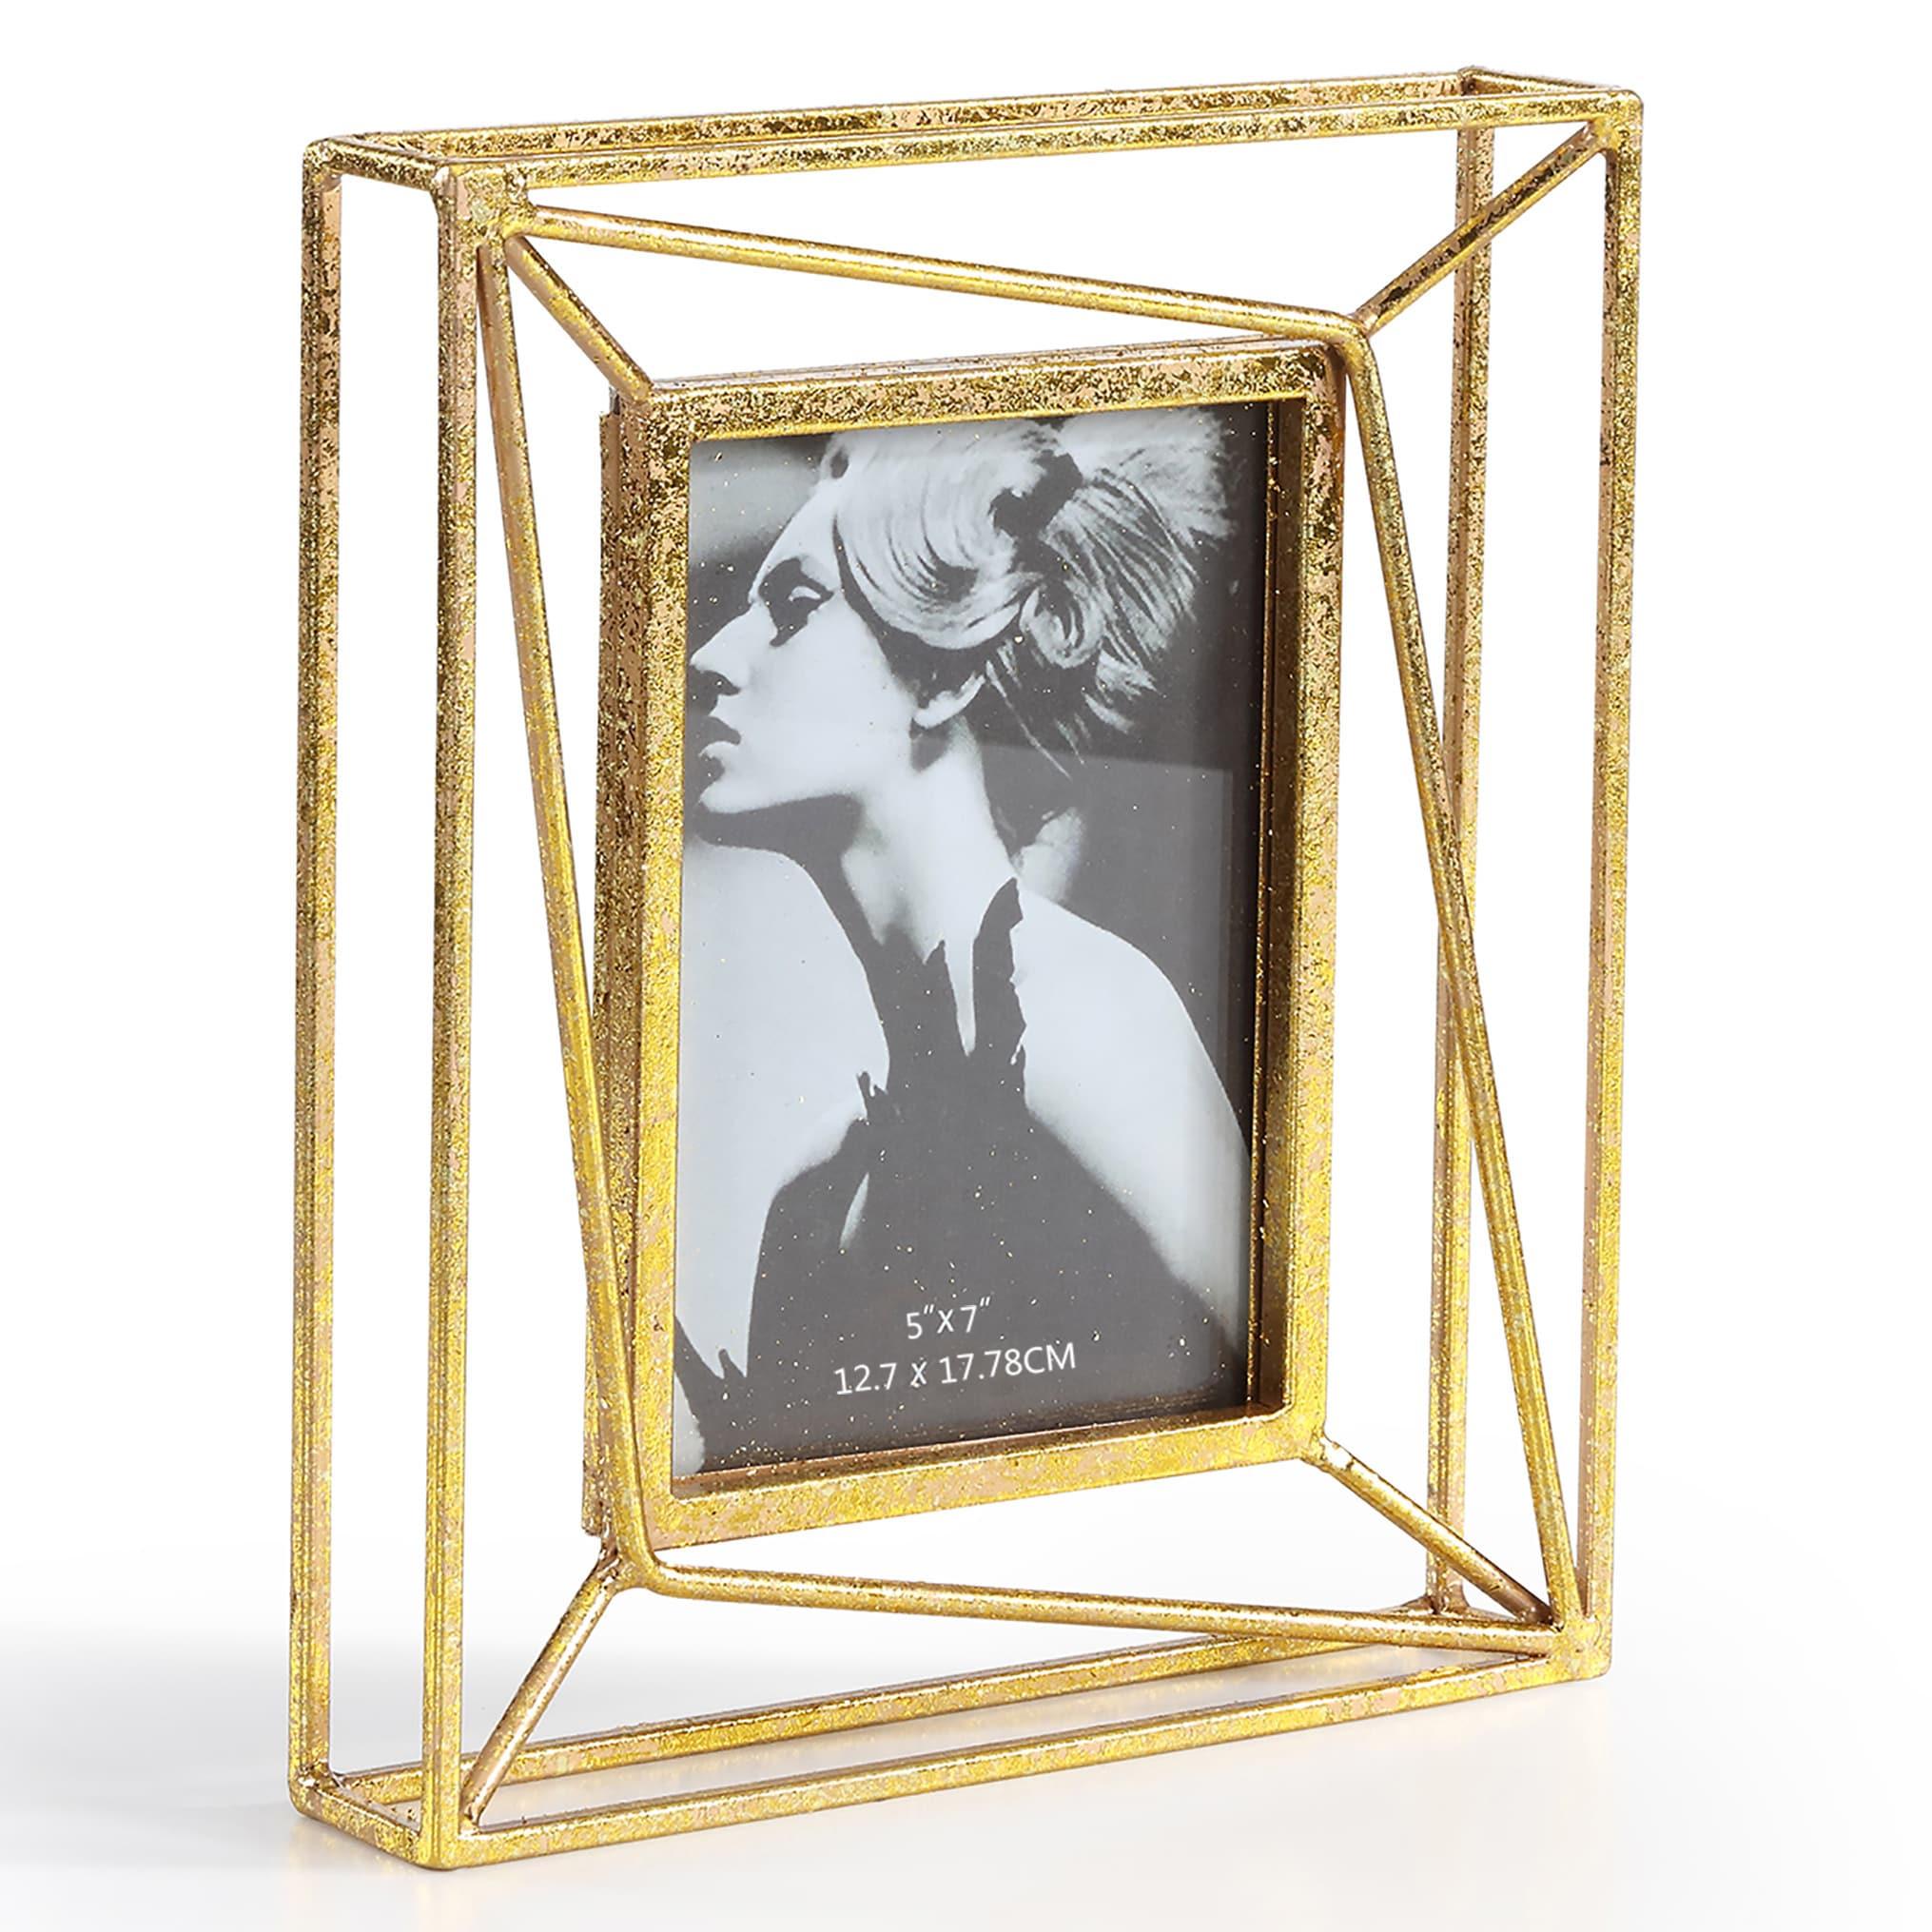 Shop Danya B. Sparkling Gold Geometric 5 x 7 Photo Frame - Free ...